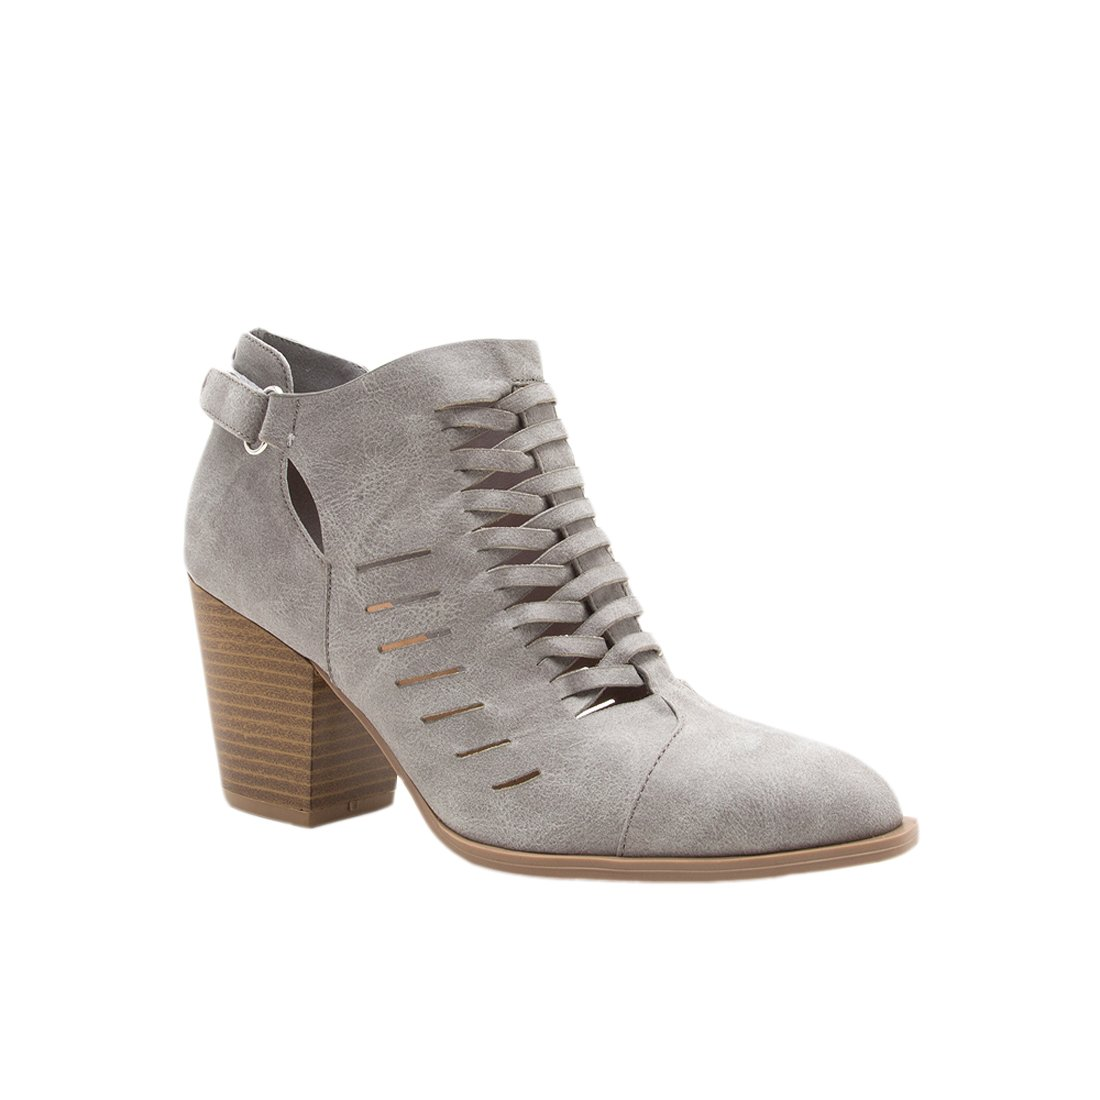 Qupid Women's Prenton-05X Ankle Boot B074NHK5D6 10 B(M) US Light Grey